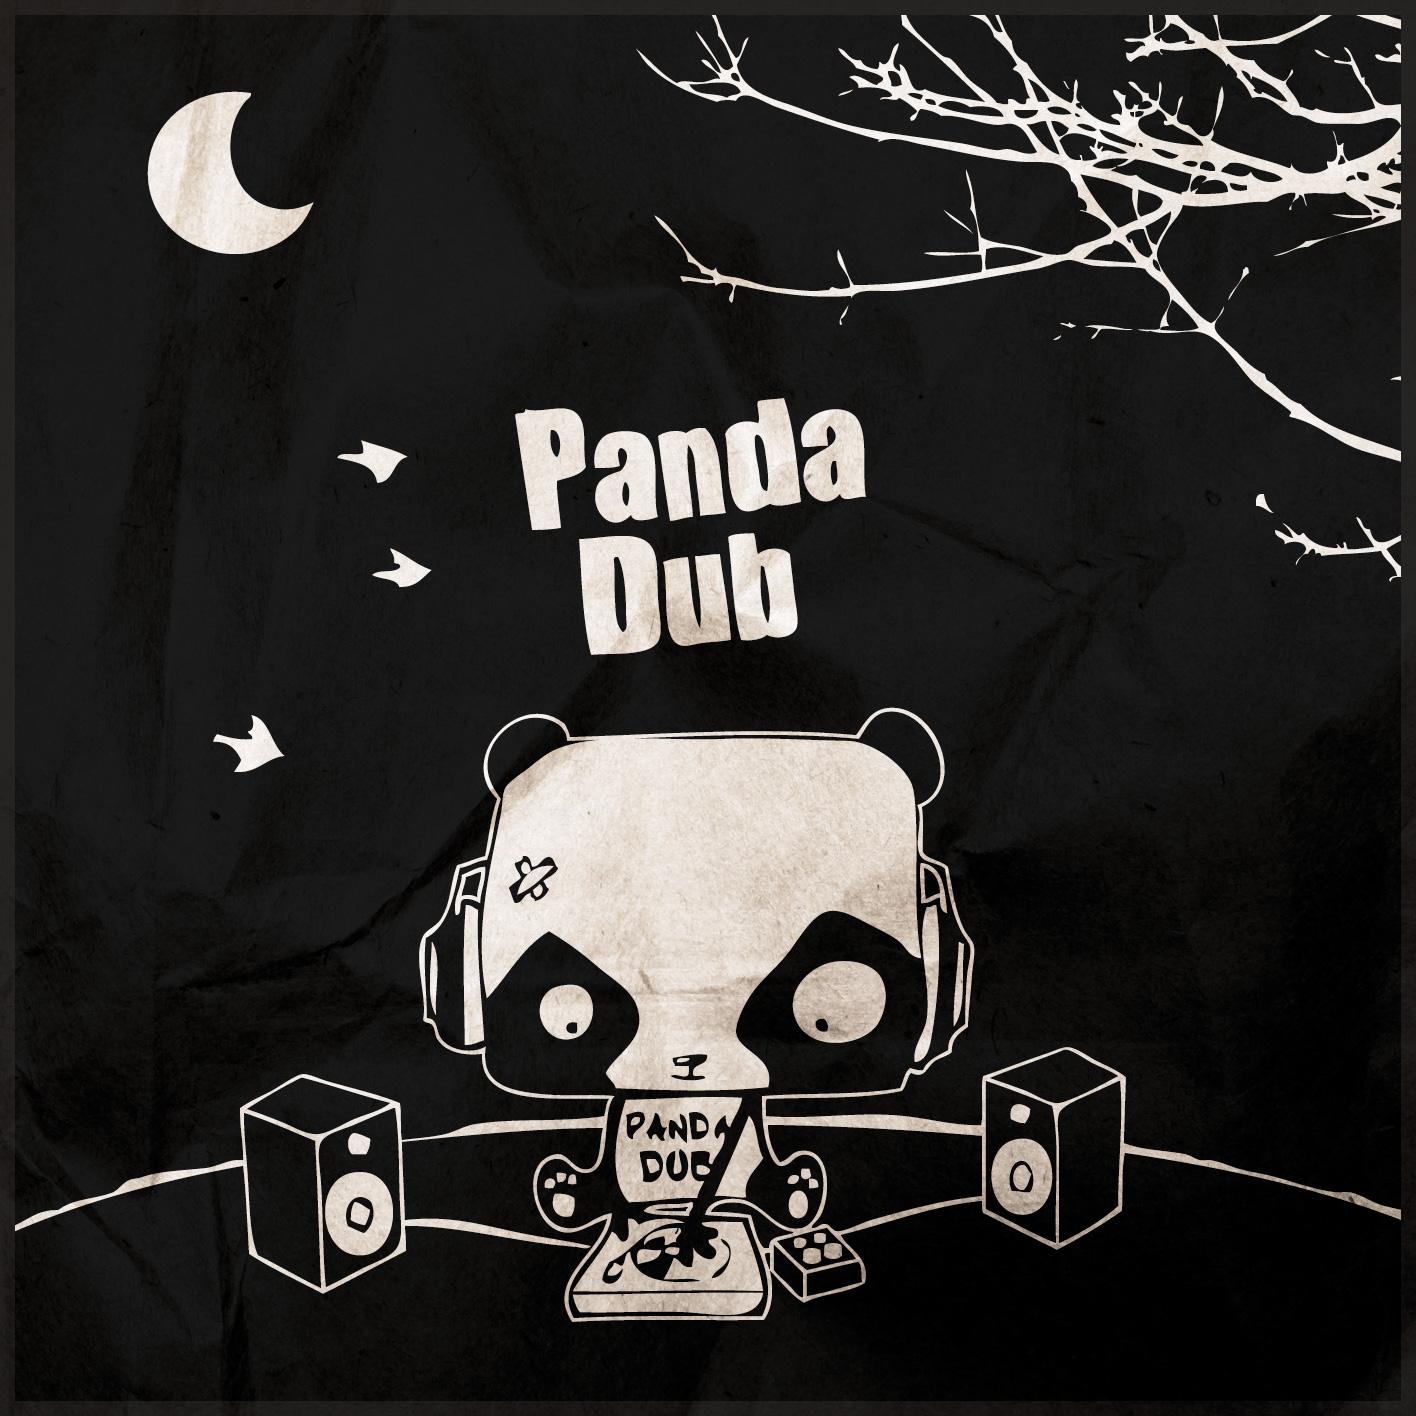 Artwork PandaDub